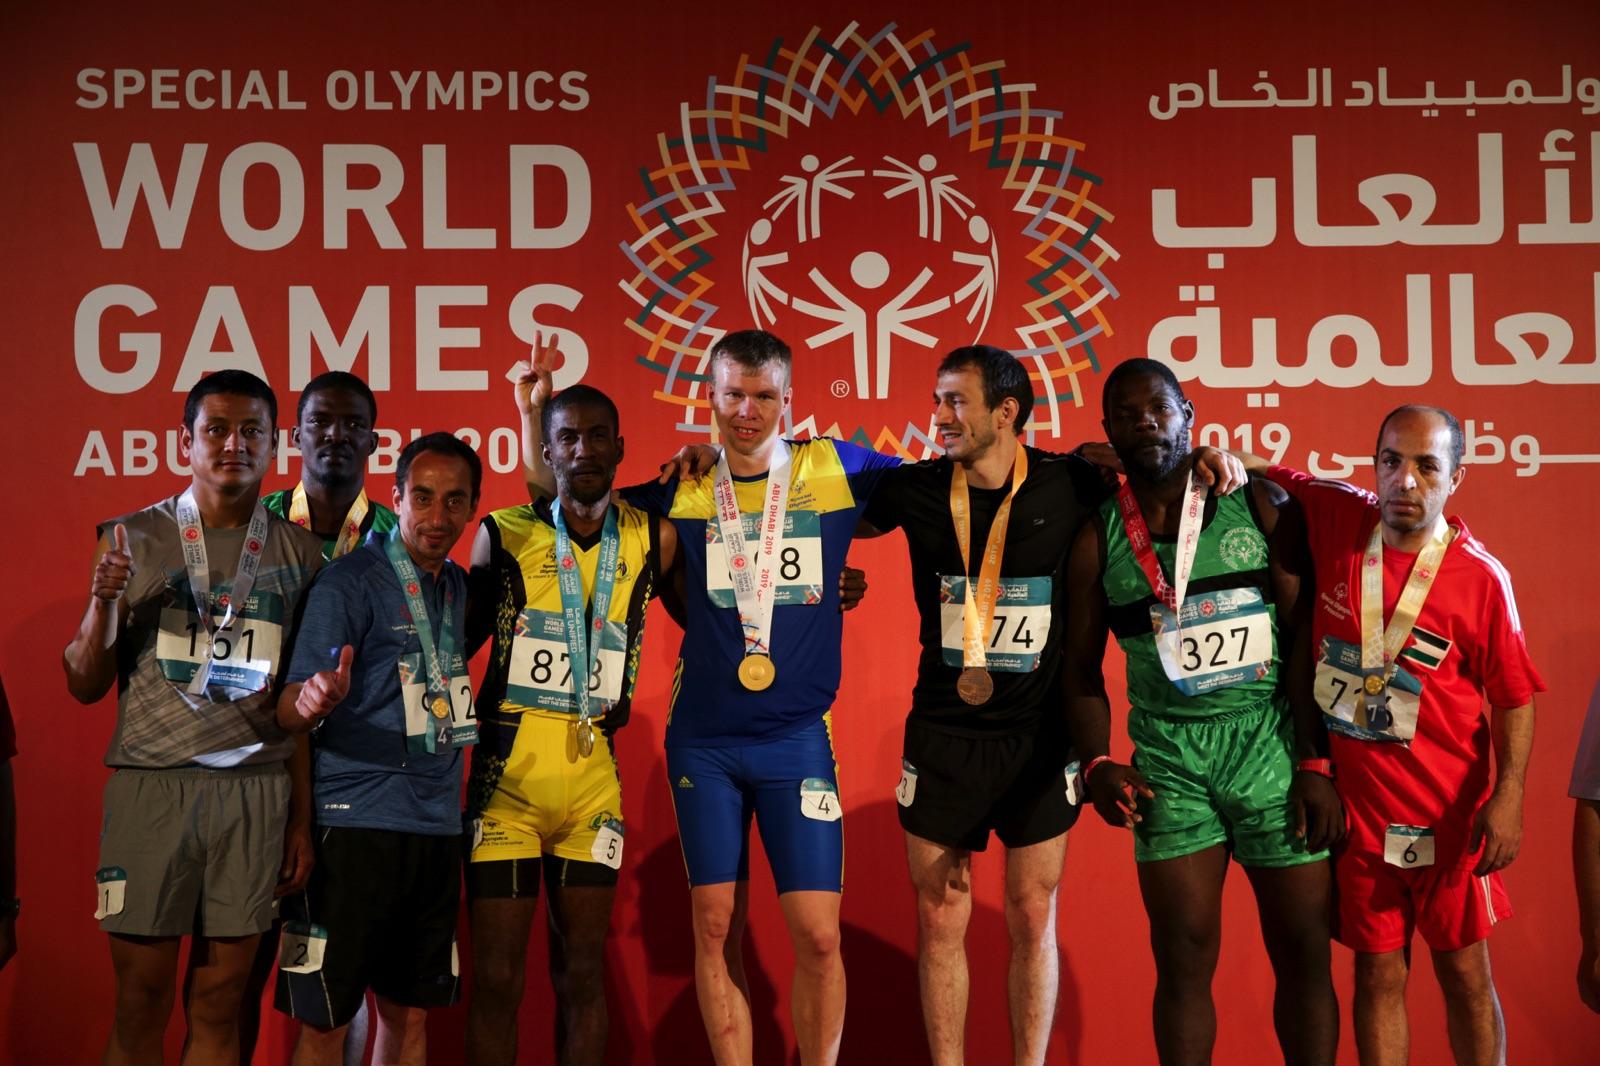 Friidrottaren Simon Martinsson gjorde ett makalöst lopp och tog guld på 200 meter.